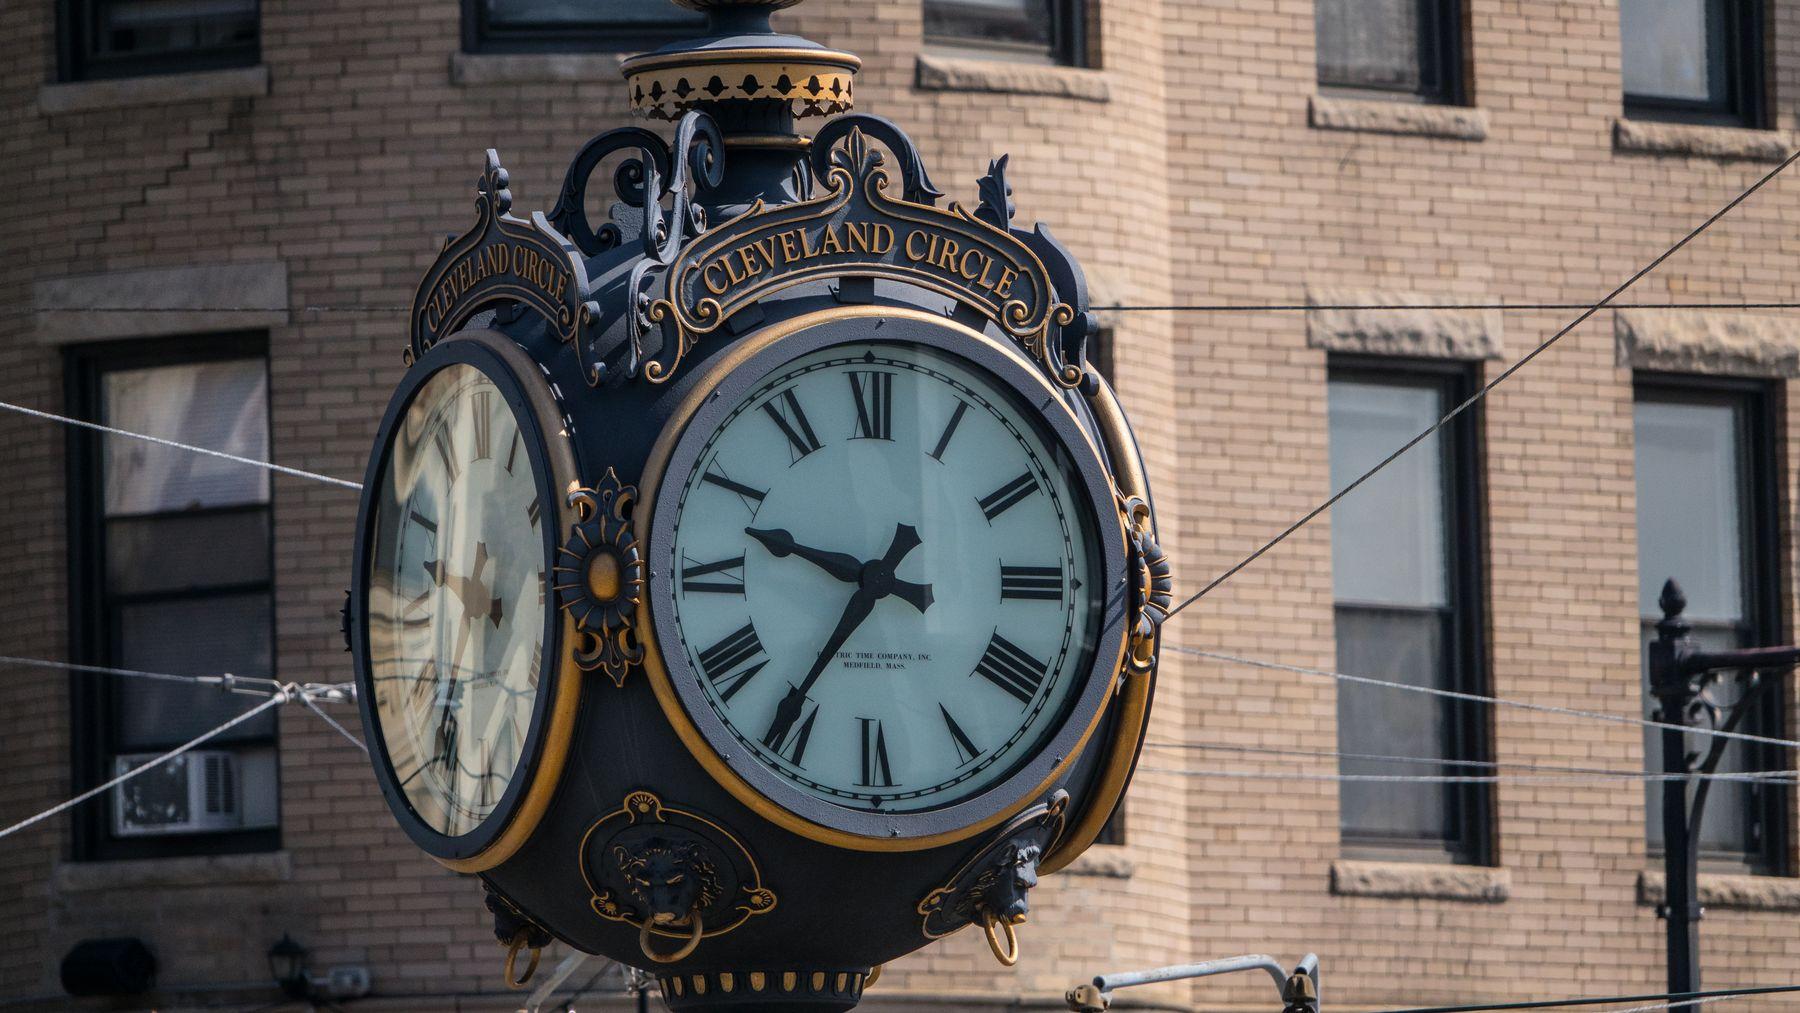 Clock in Cleveland Circle